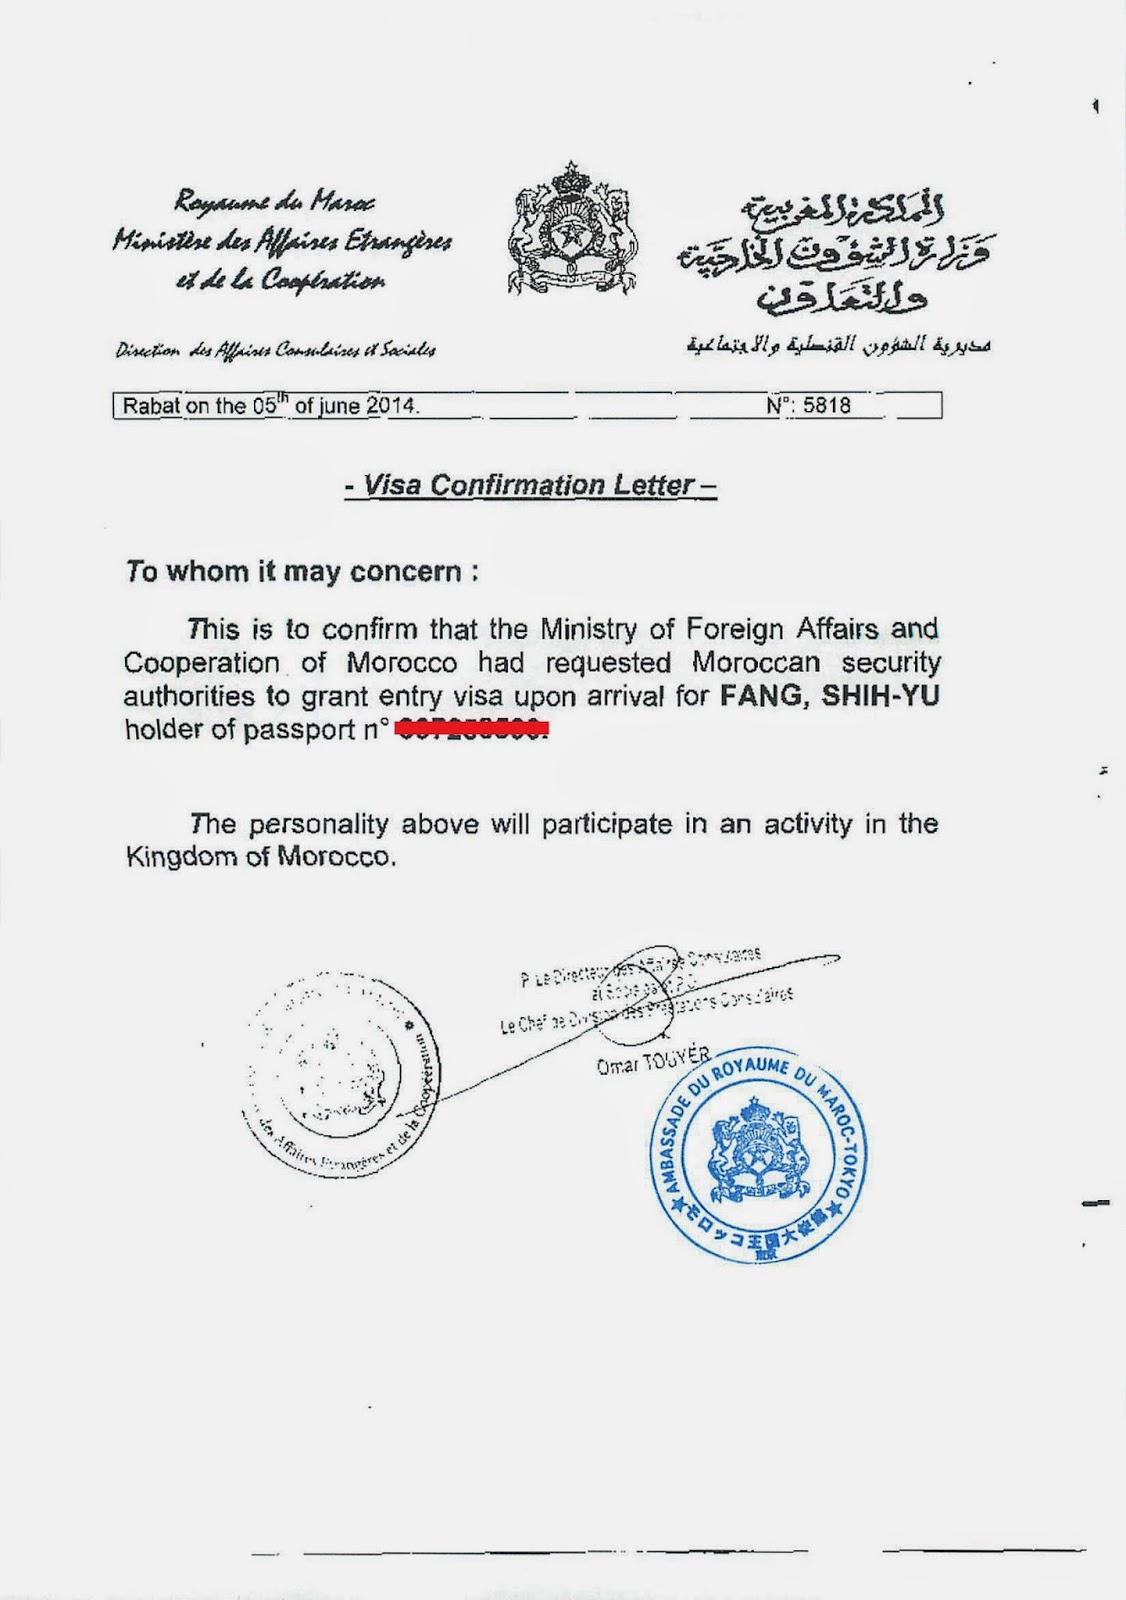 Visa confirmation letter vs tourist visa morocco forum tripadvisor thecheapjerseys Images